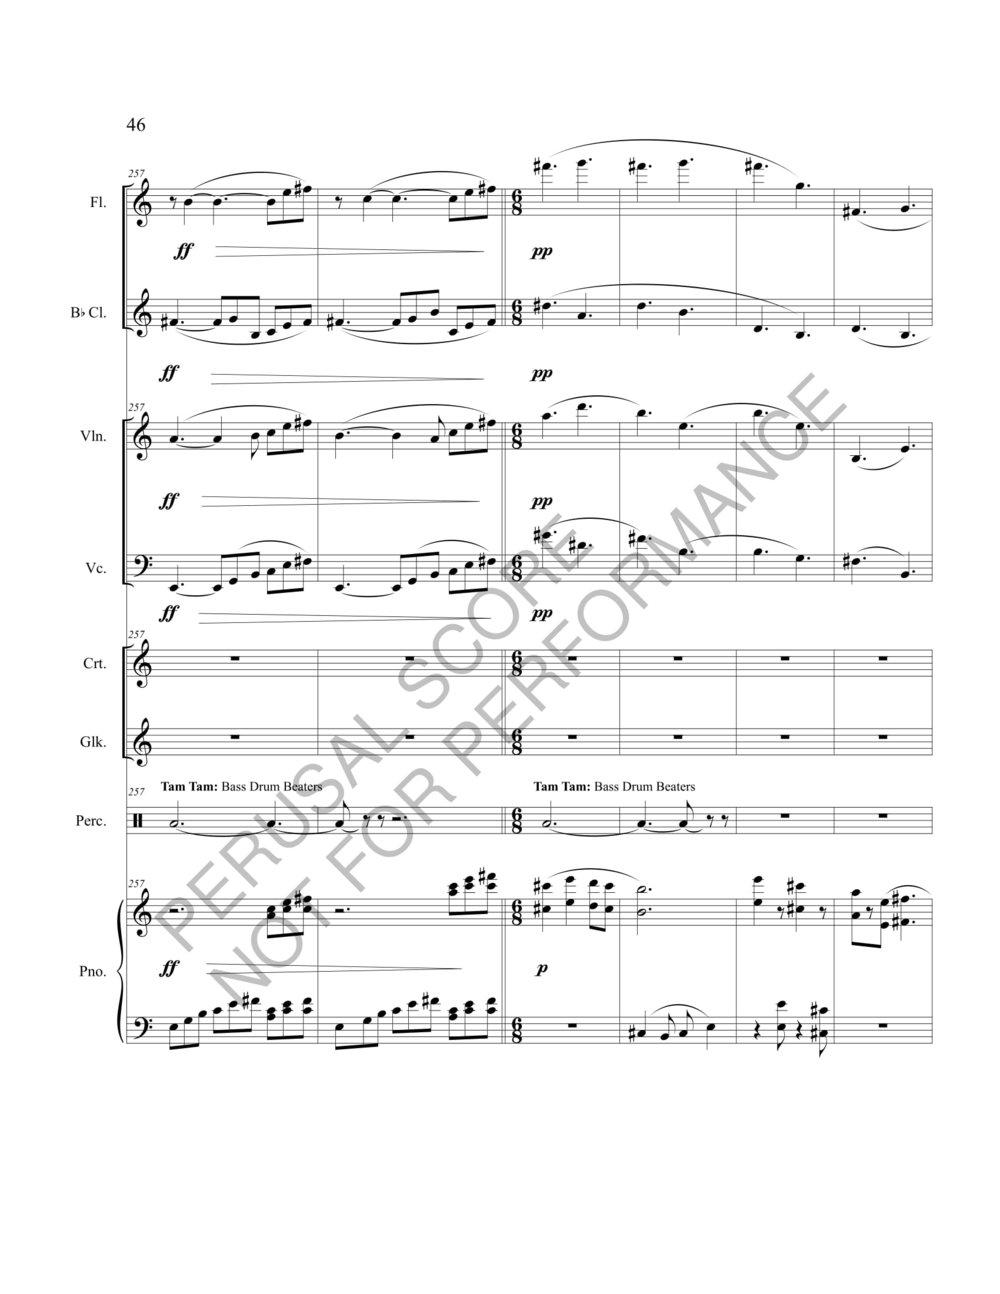 Boyd Terra Liberi Score-watermark-52.jpg